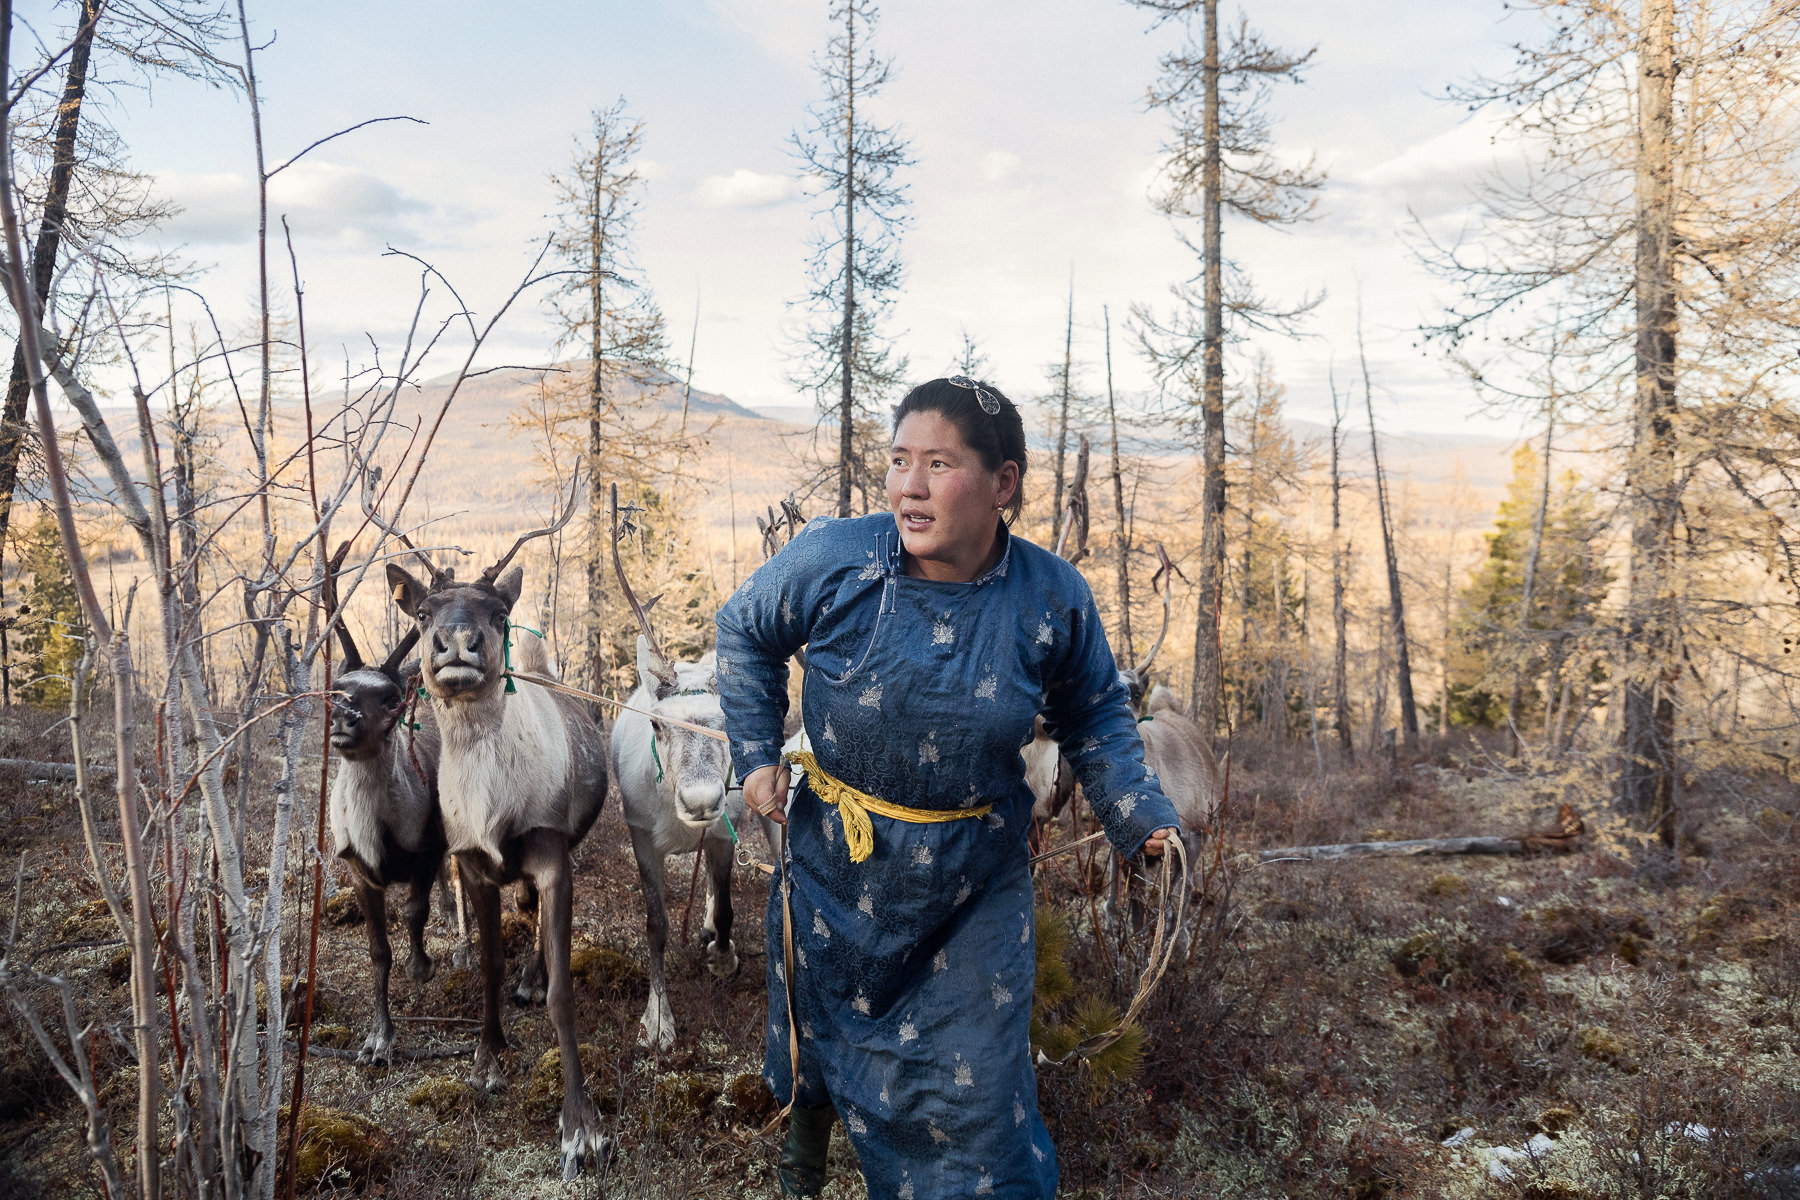 Briceportolano_Mongolia_Zaya_01_WEB.jpg